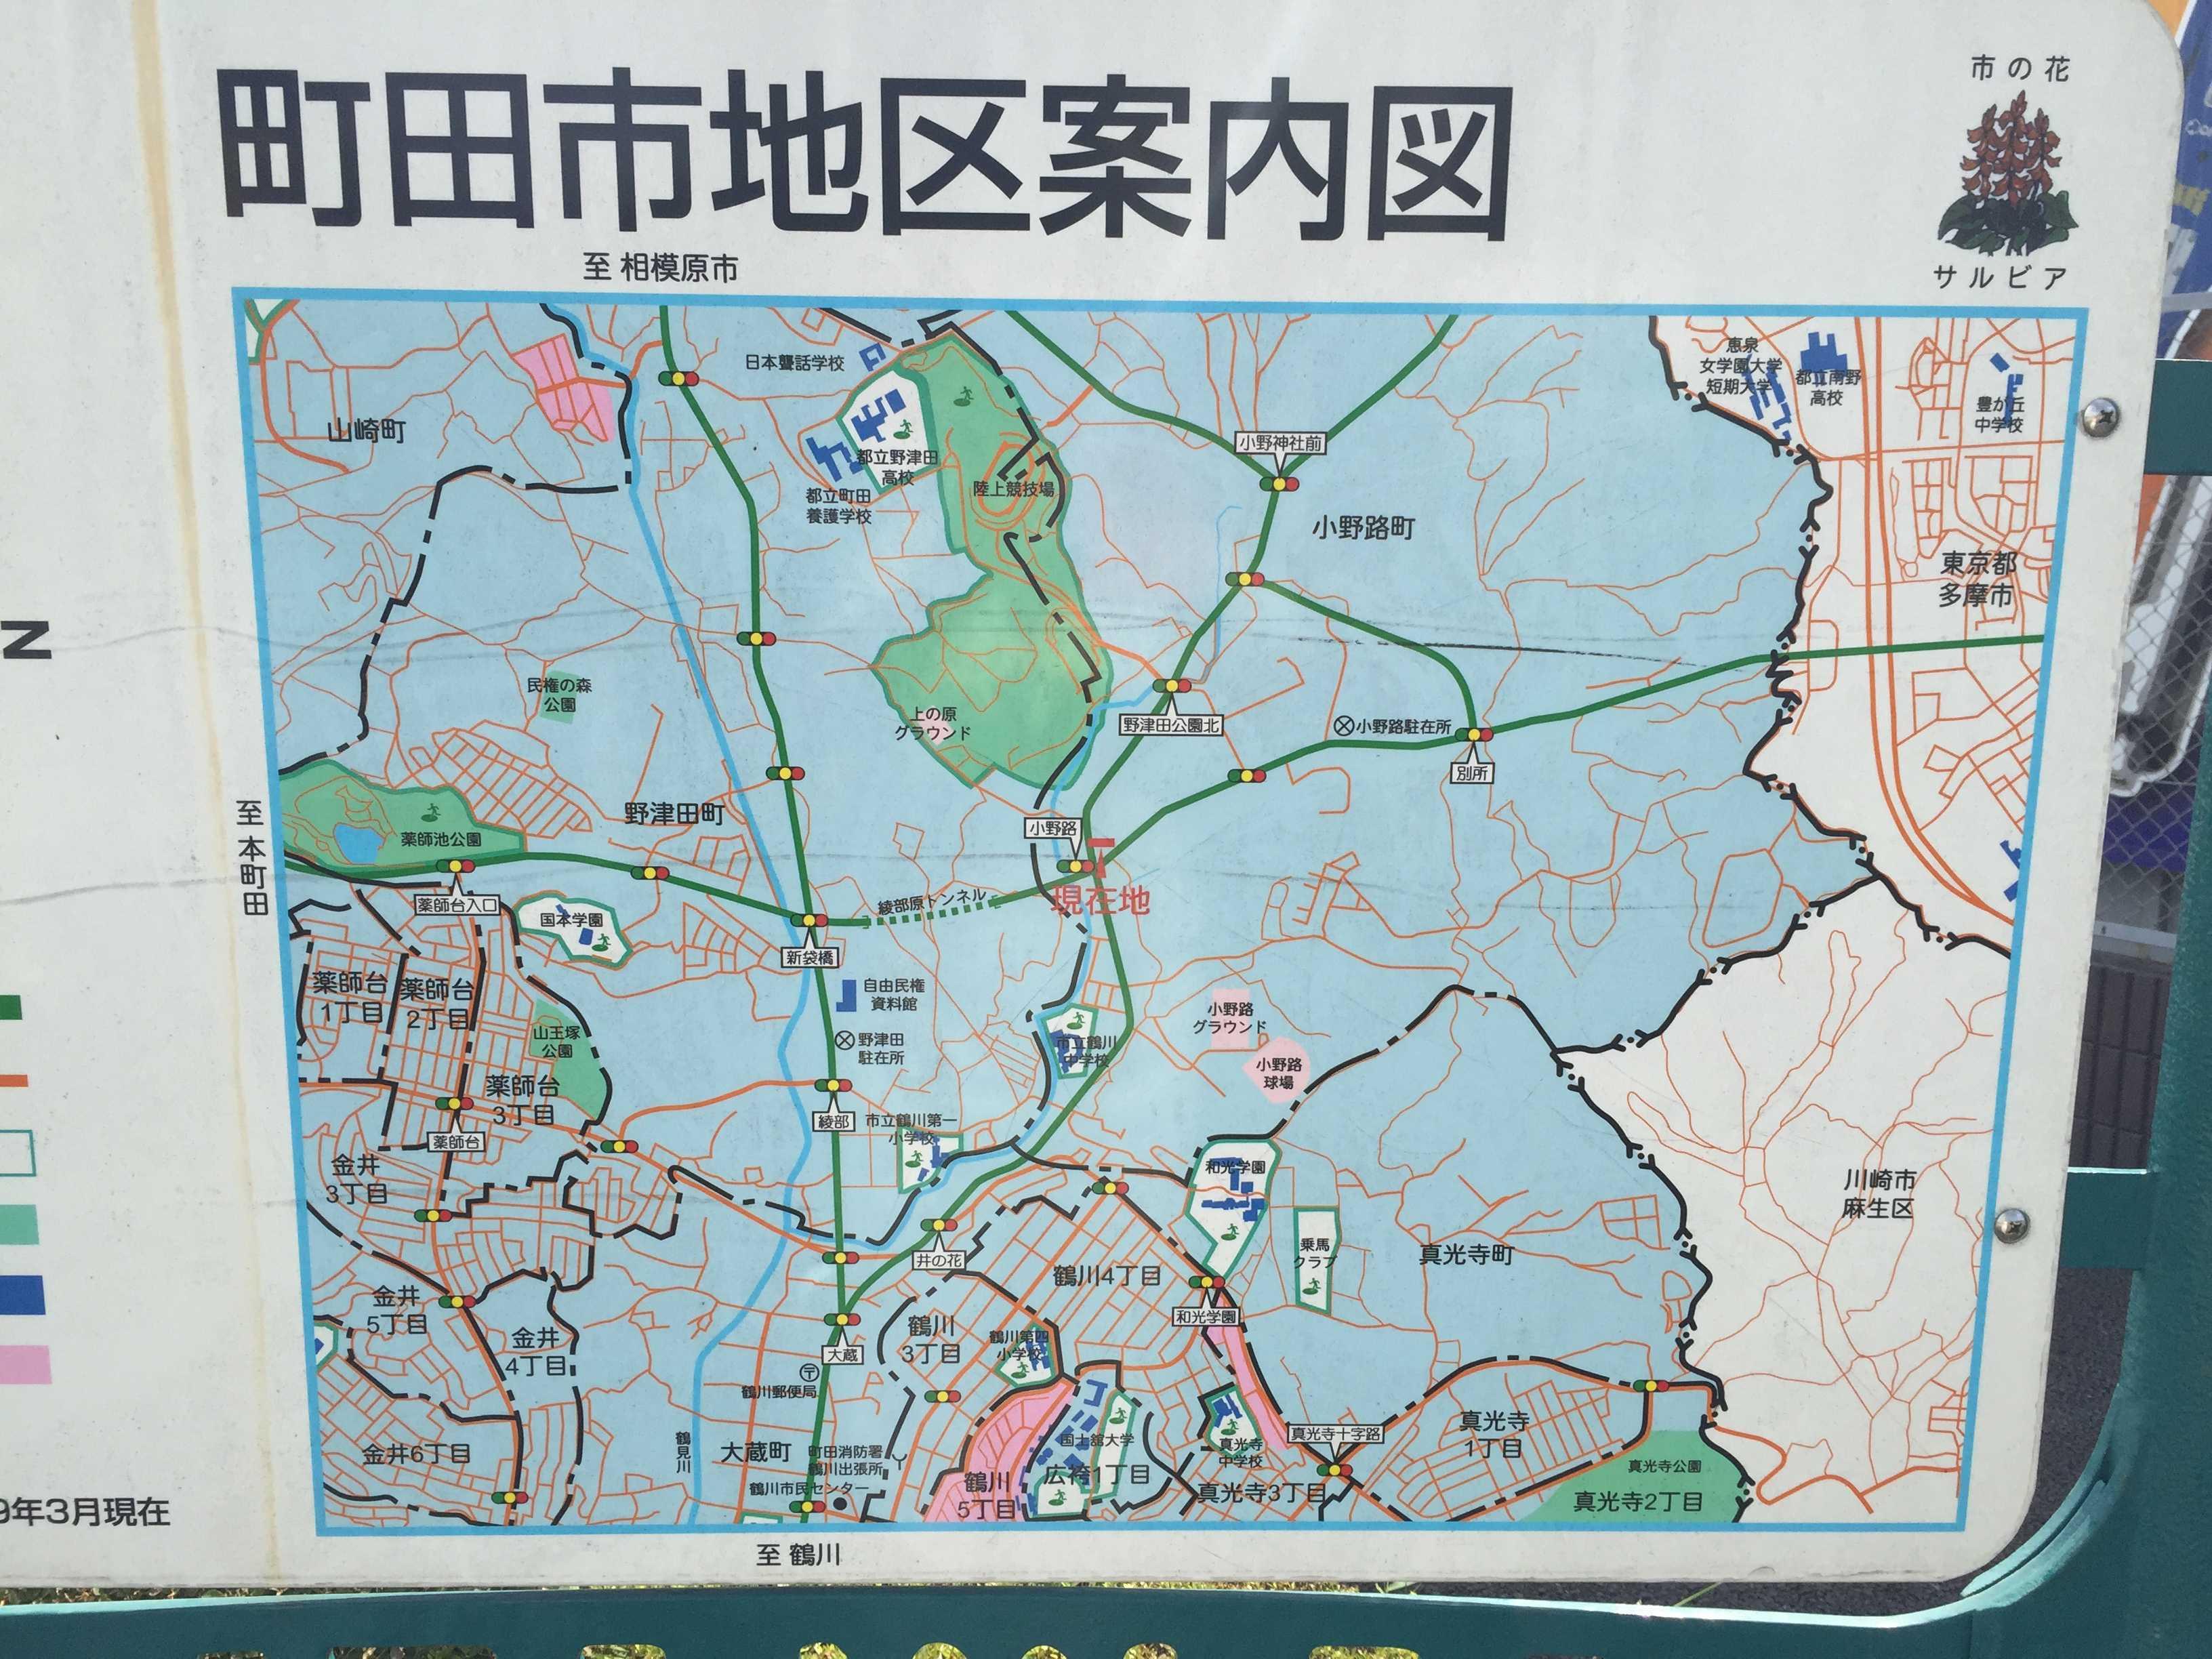 小野路交差点の町田市地区案内図